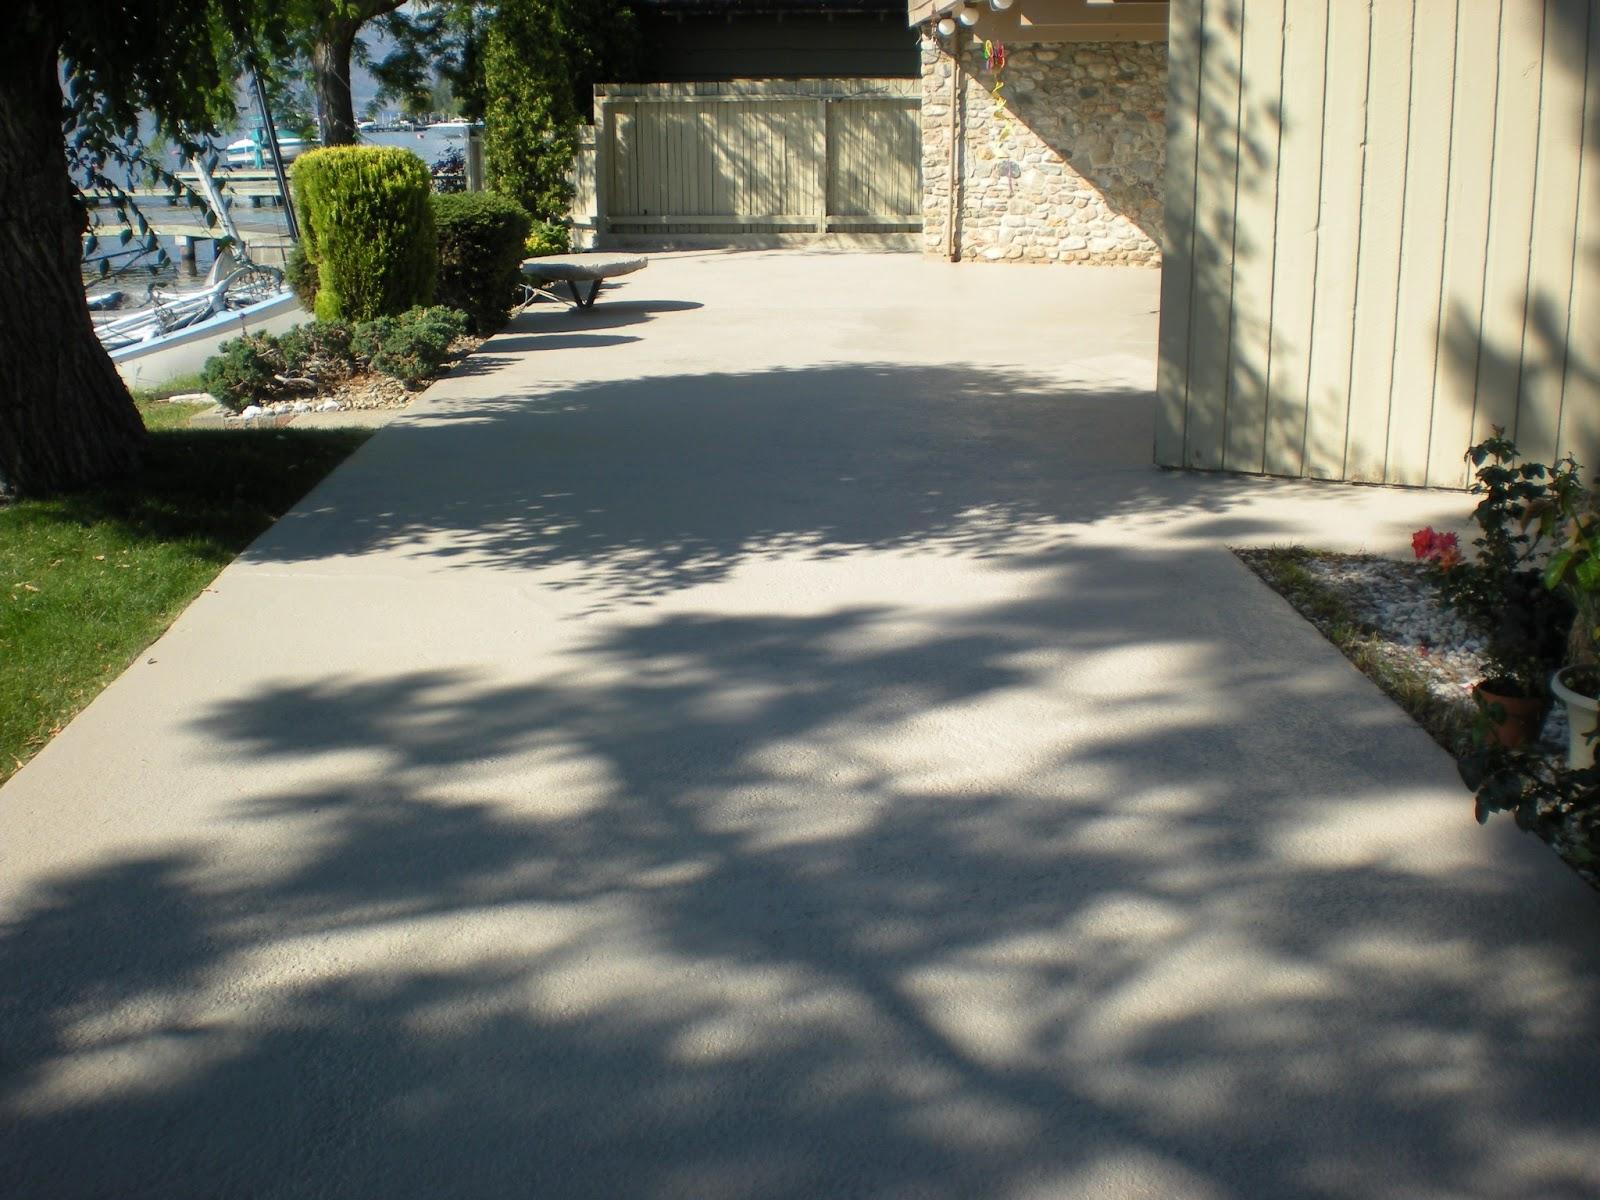 Mode Concrete Mode Concrete Are Experts In The